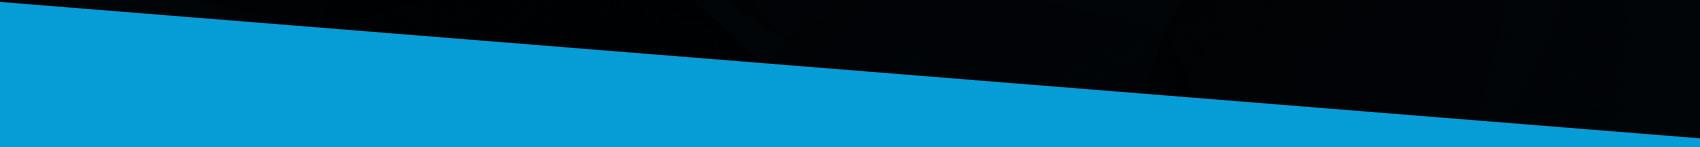 Hire Xamarin Consltants | xamarin development company in California, USA